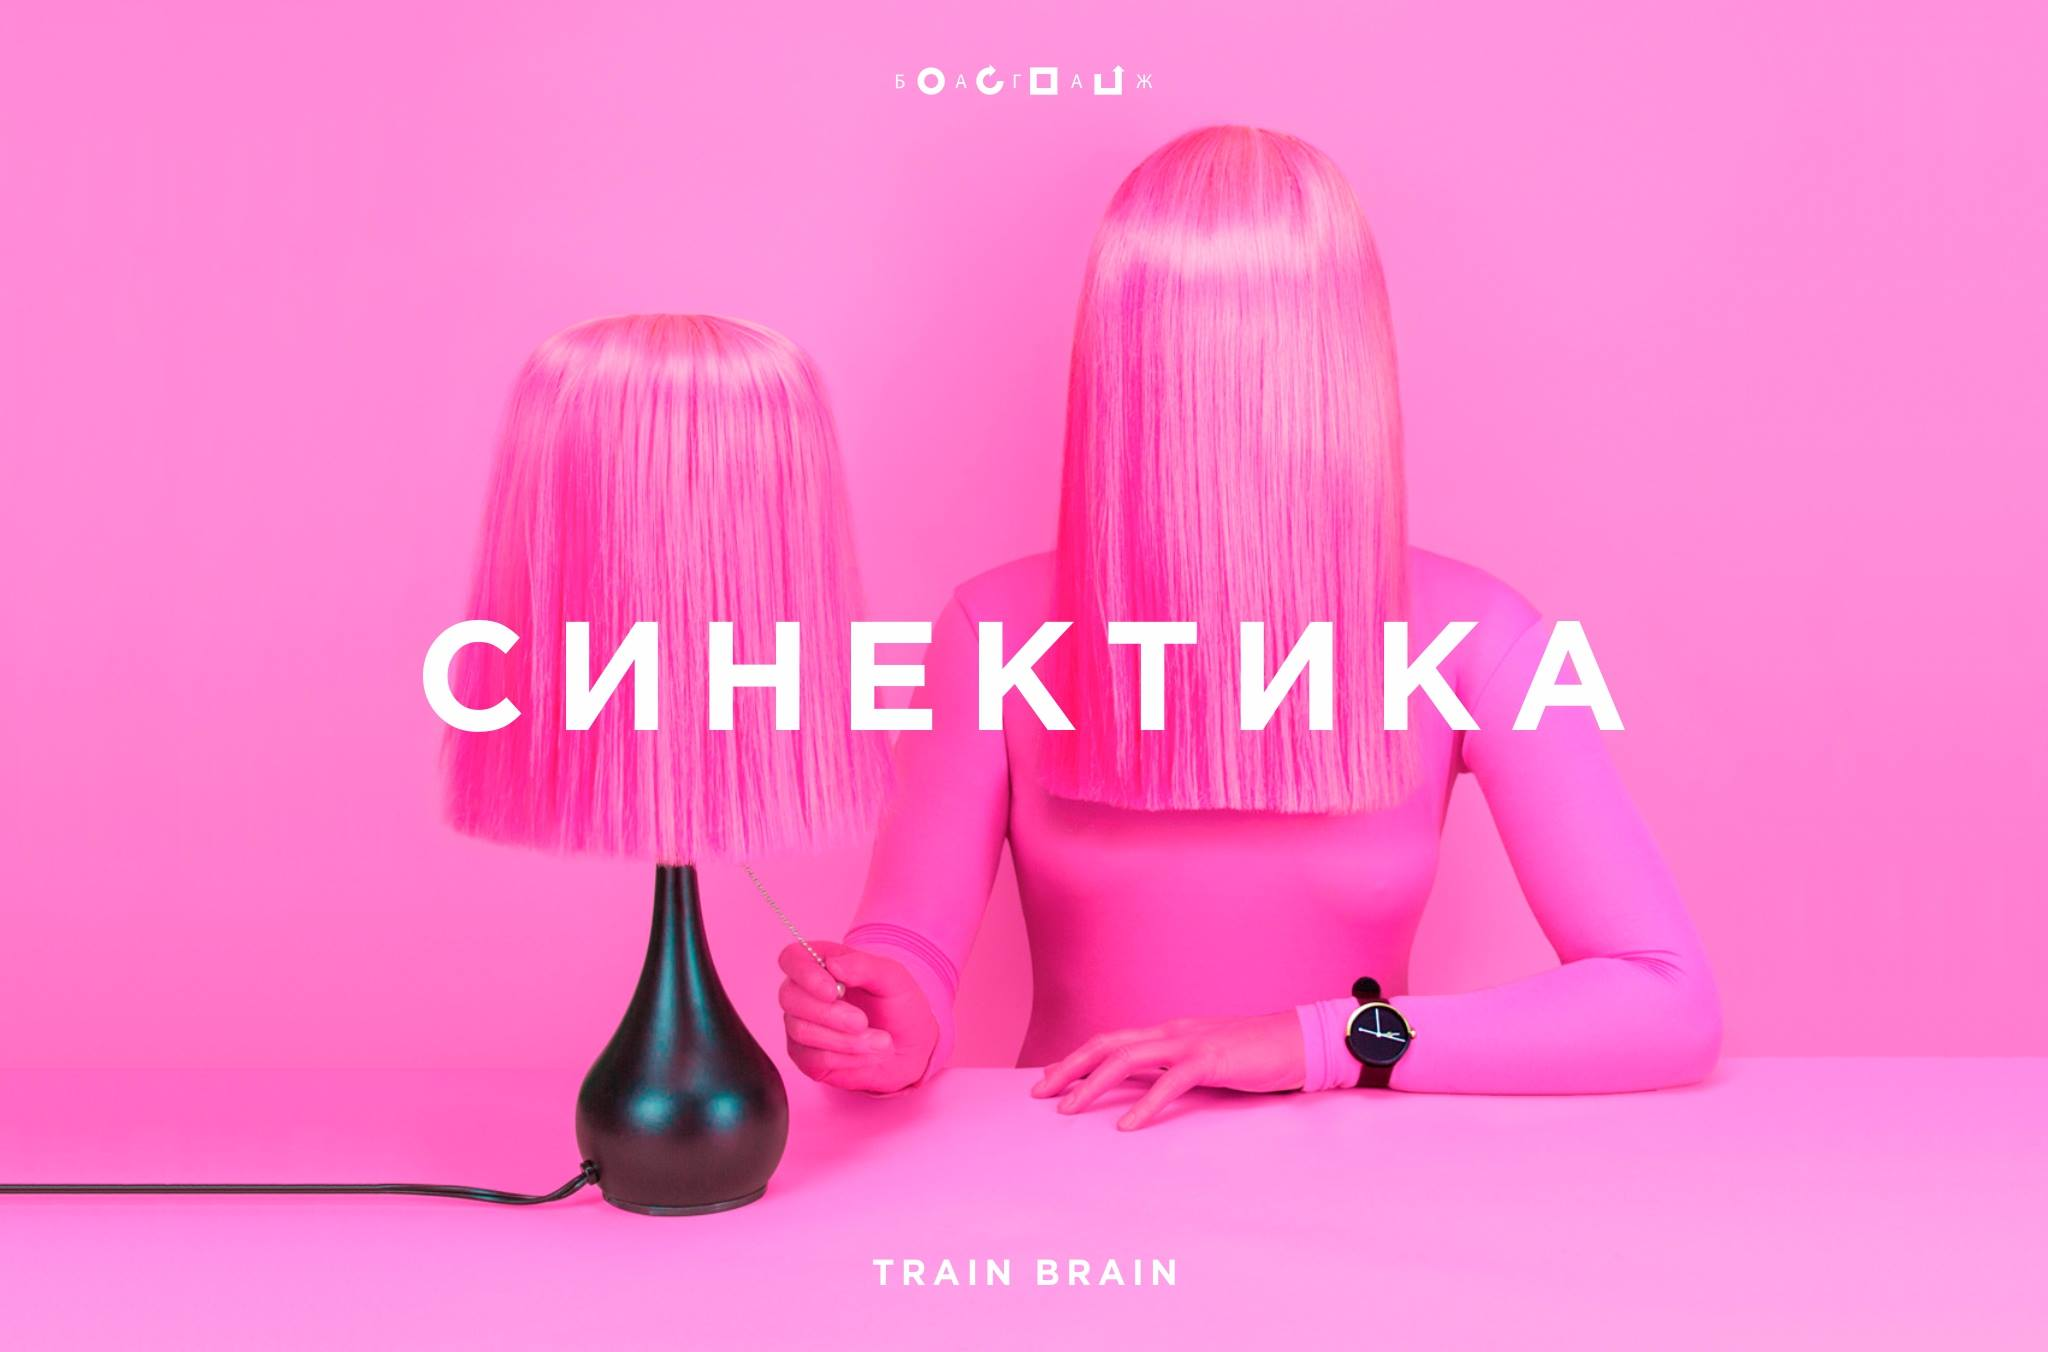 50_october_2017_СИНЕКТИКА